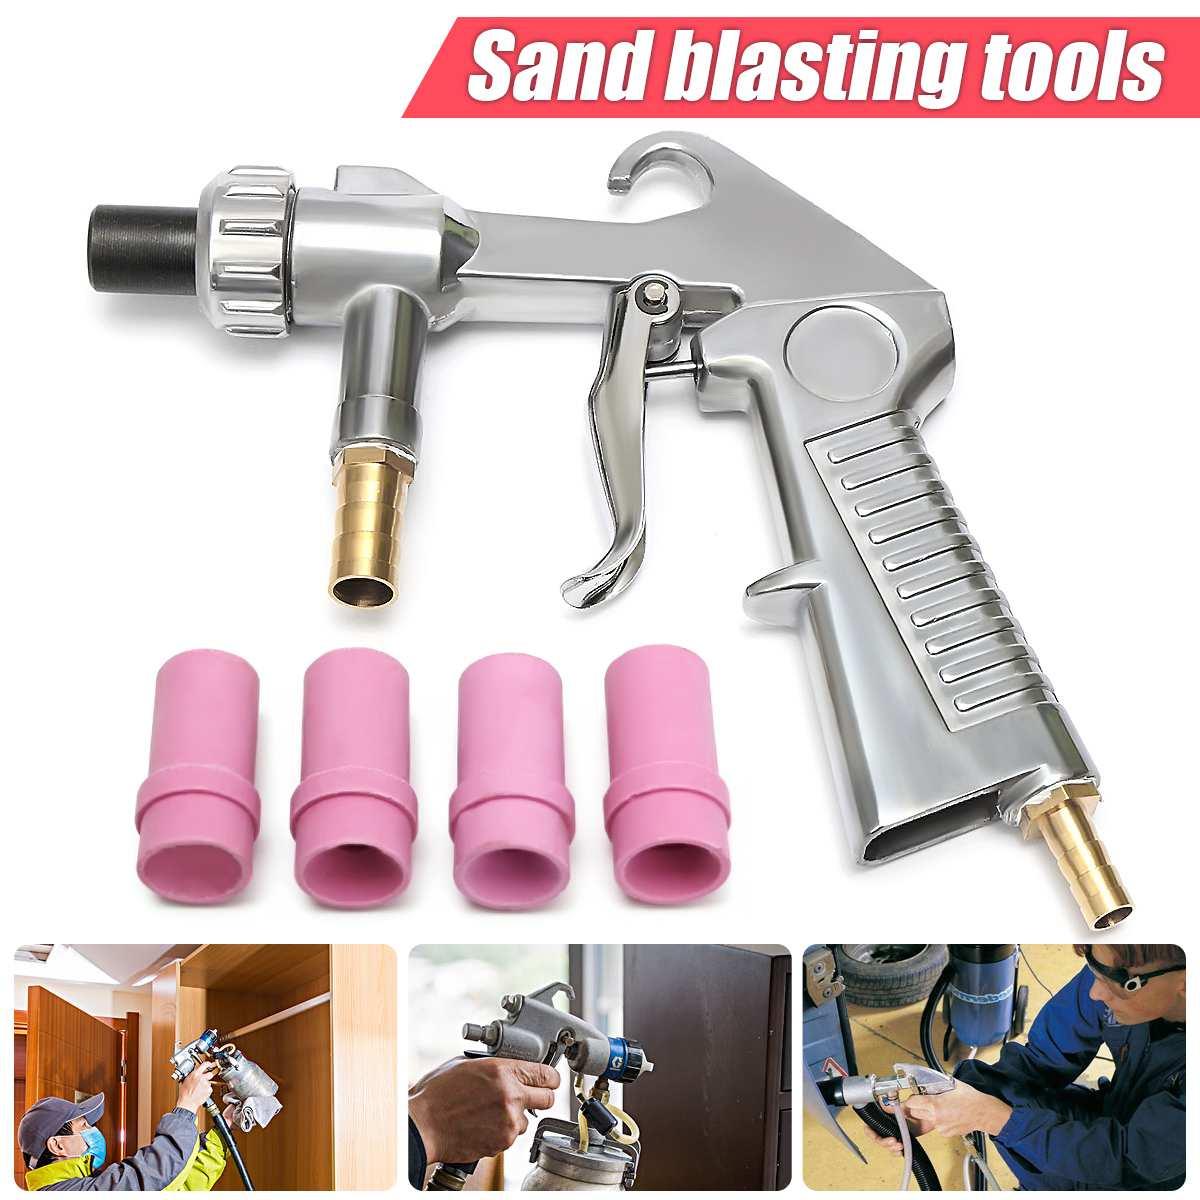 Sandblaster Air Siphon Feed Blast Nozzle Ceramic Tips Abrasive Sand Blasting With 4pcs Ceramic Nozzles Abrasive(China)